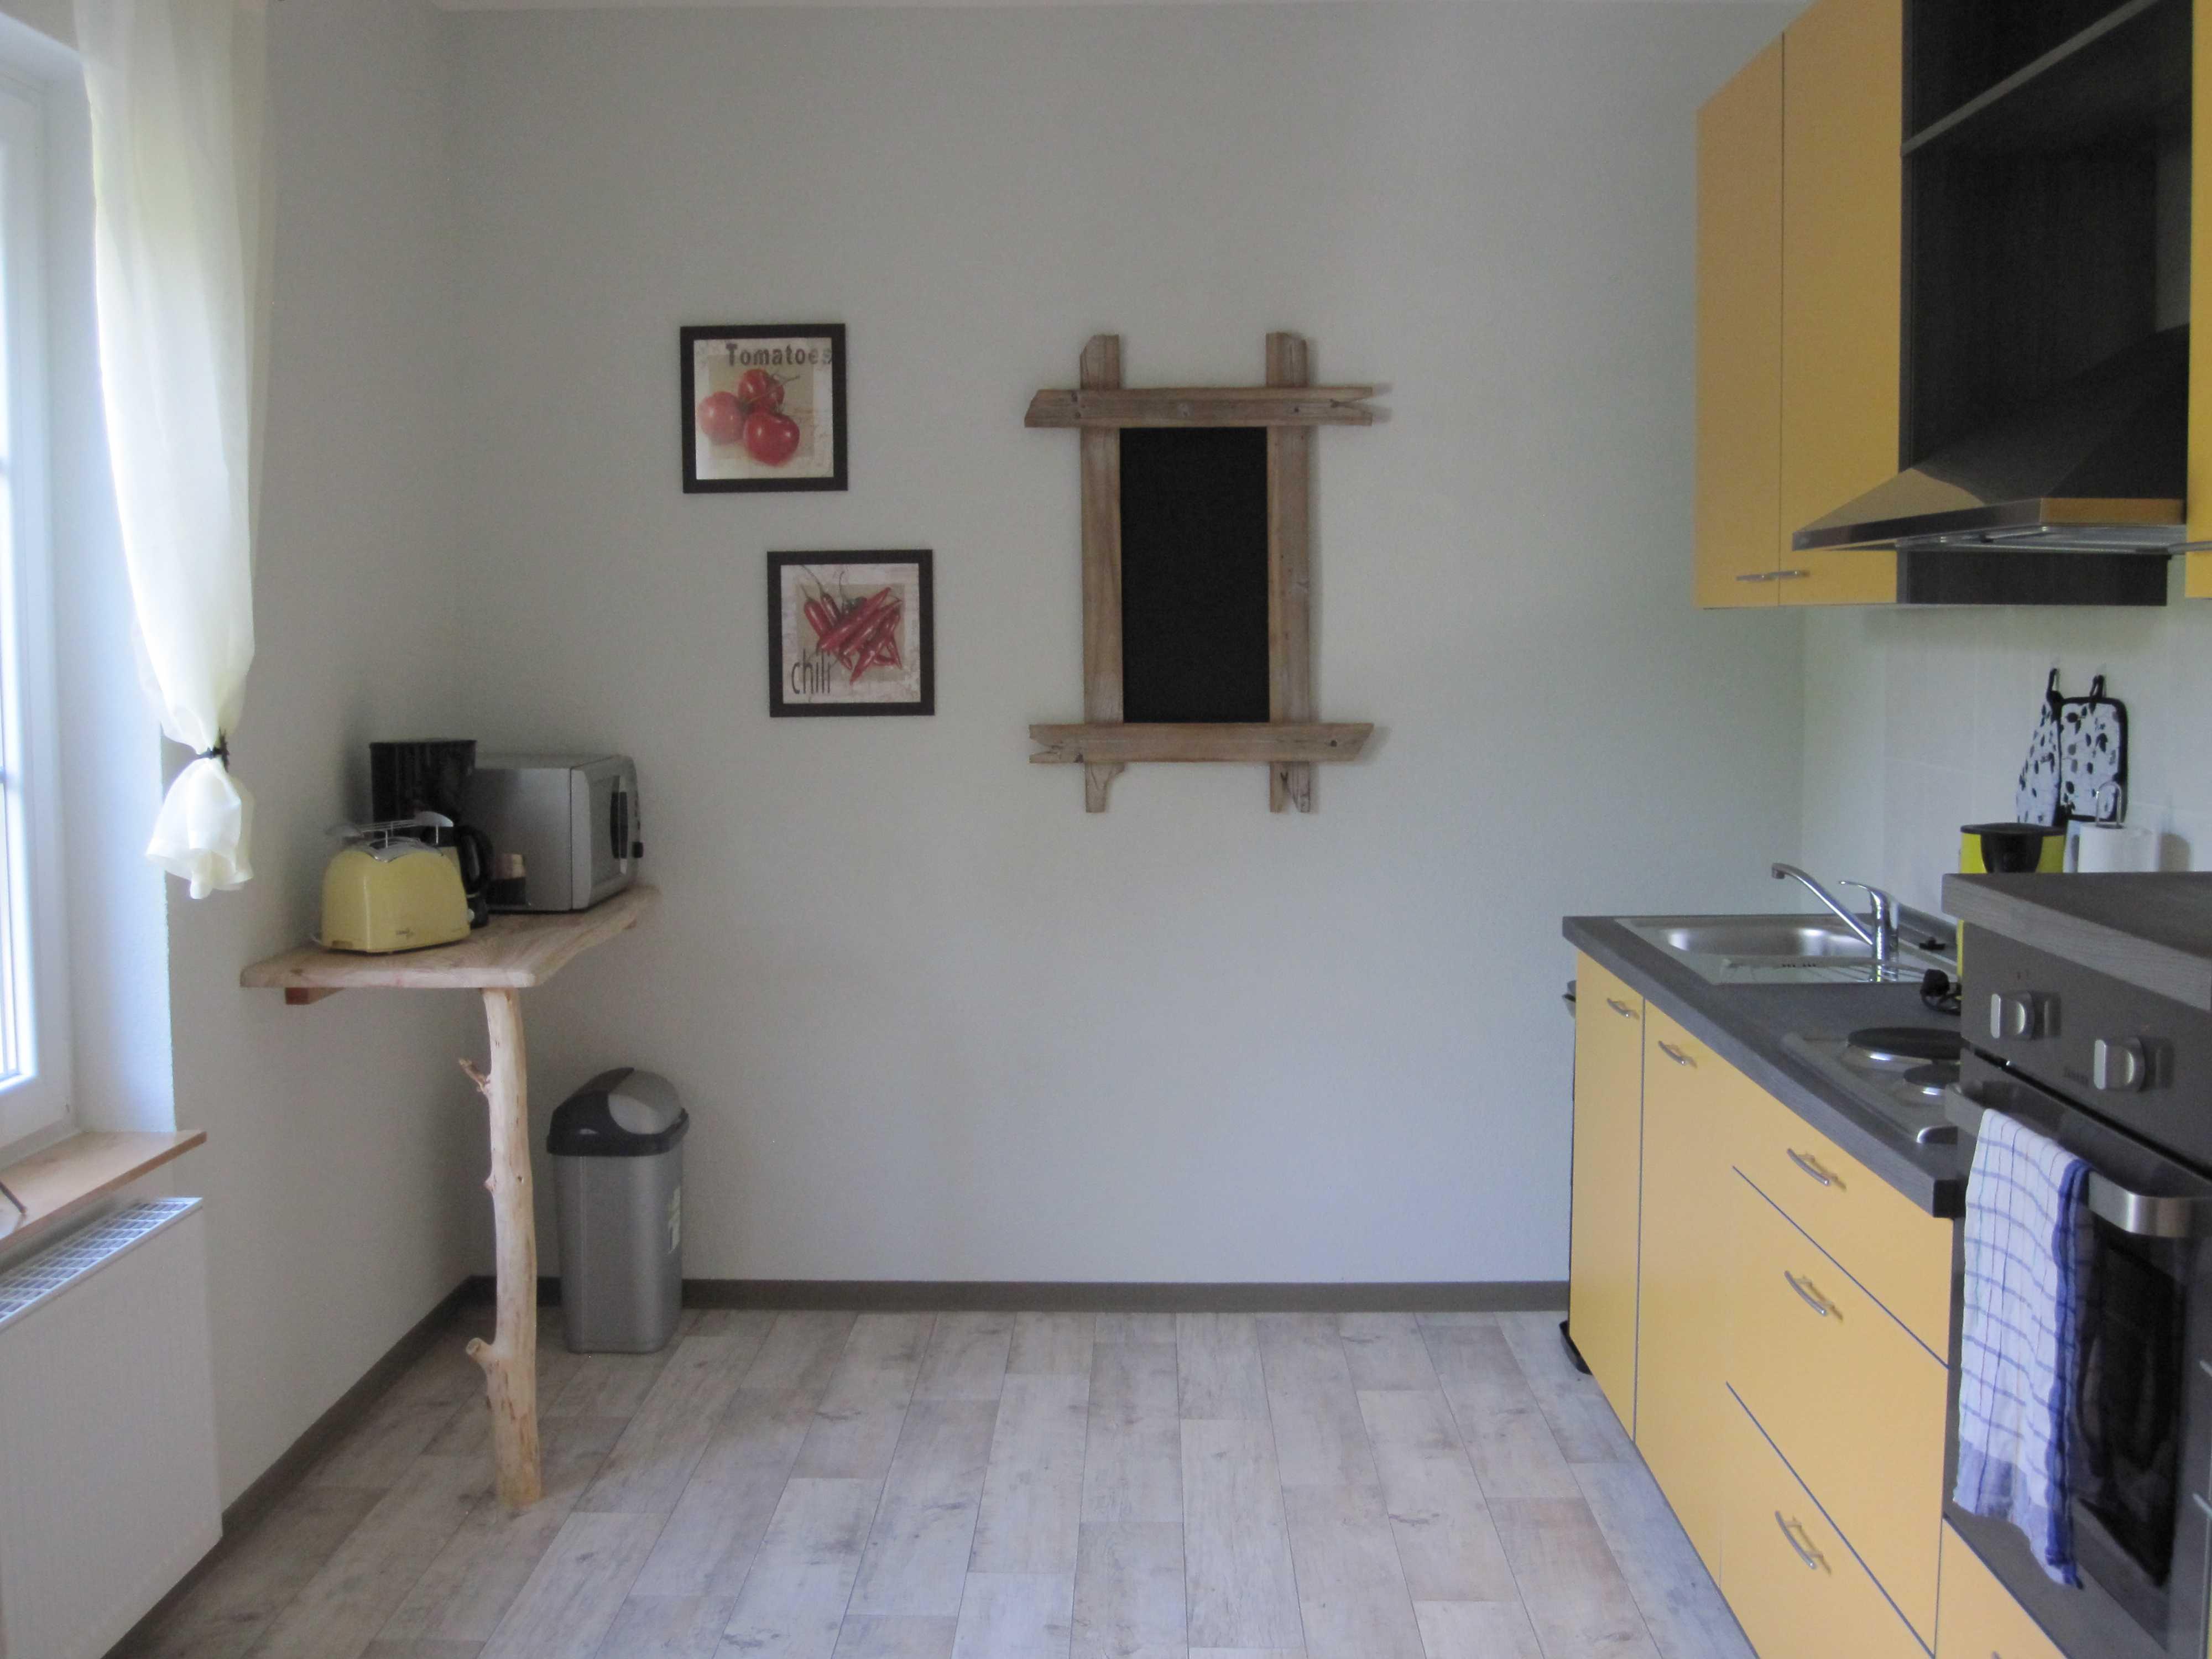 ferienhaus in ruschberg objekt 9450 ab 42 euro. Black Bedroom Furniture Sets. Home Design Ideas